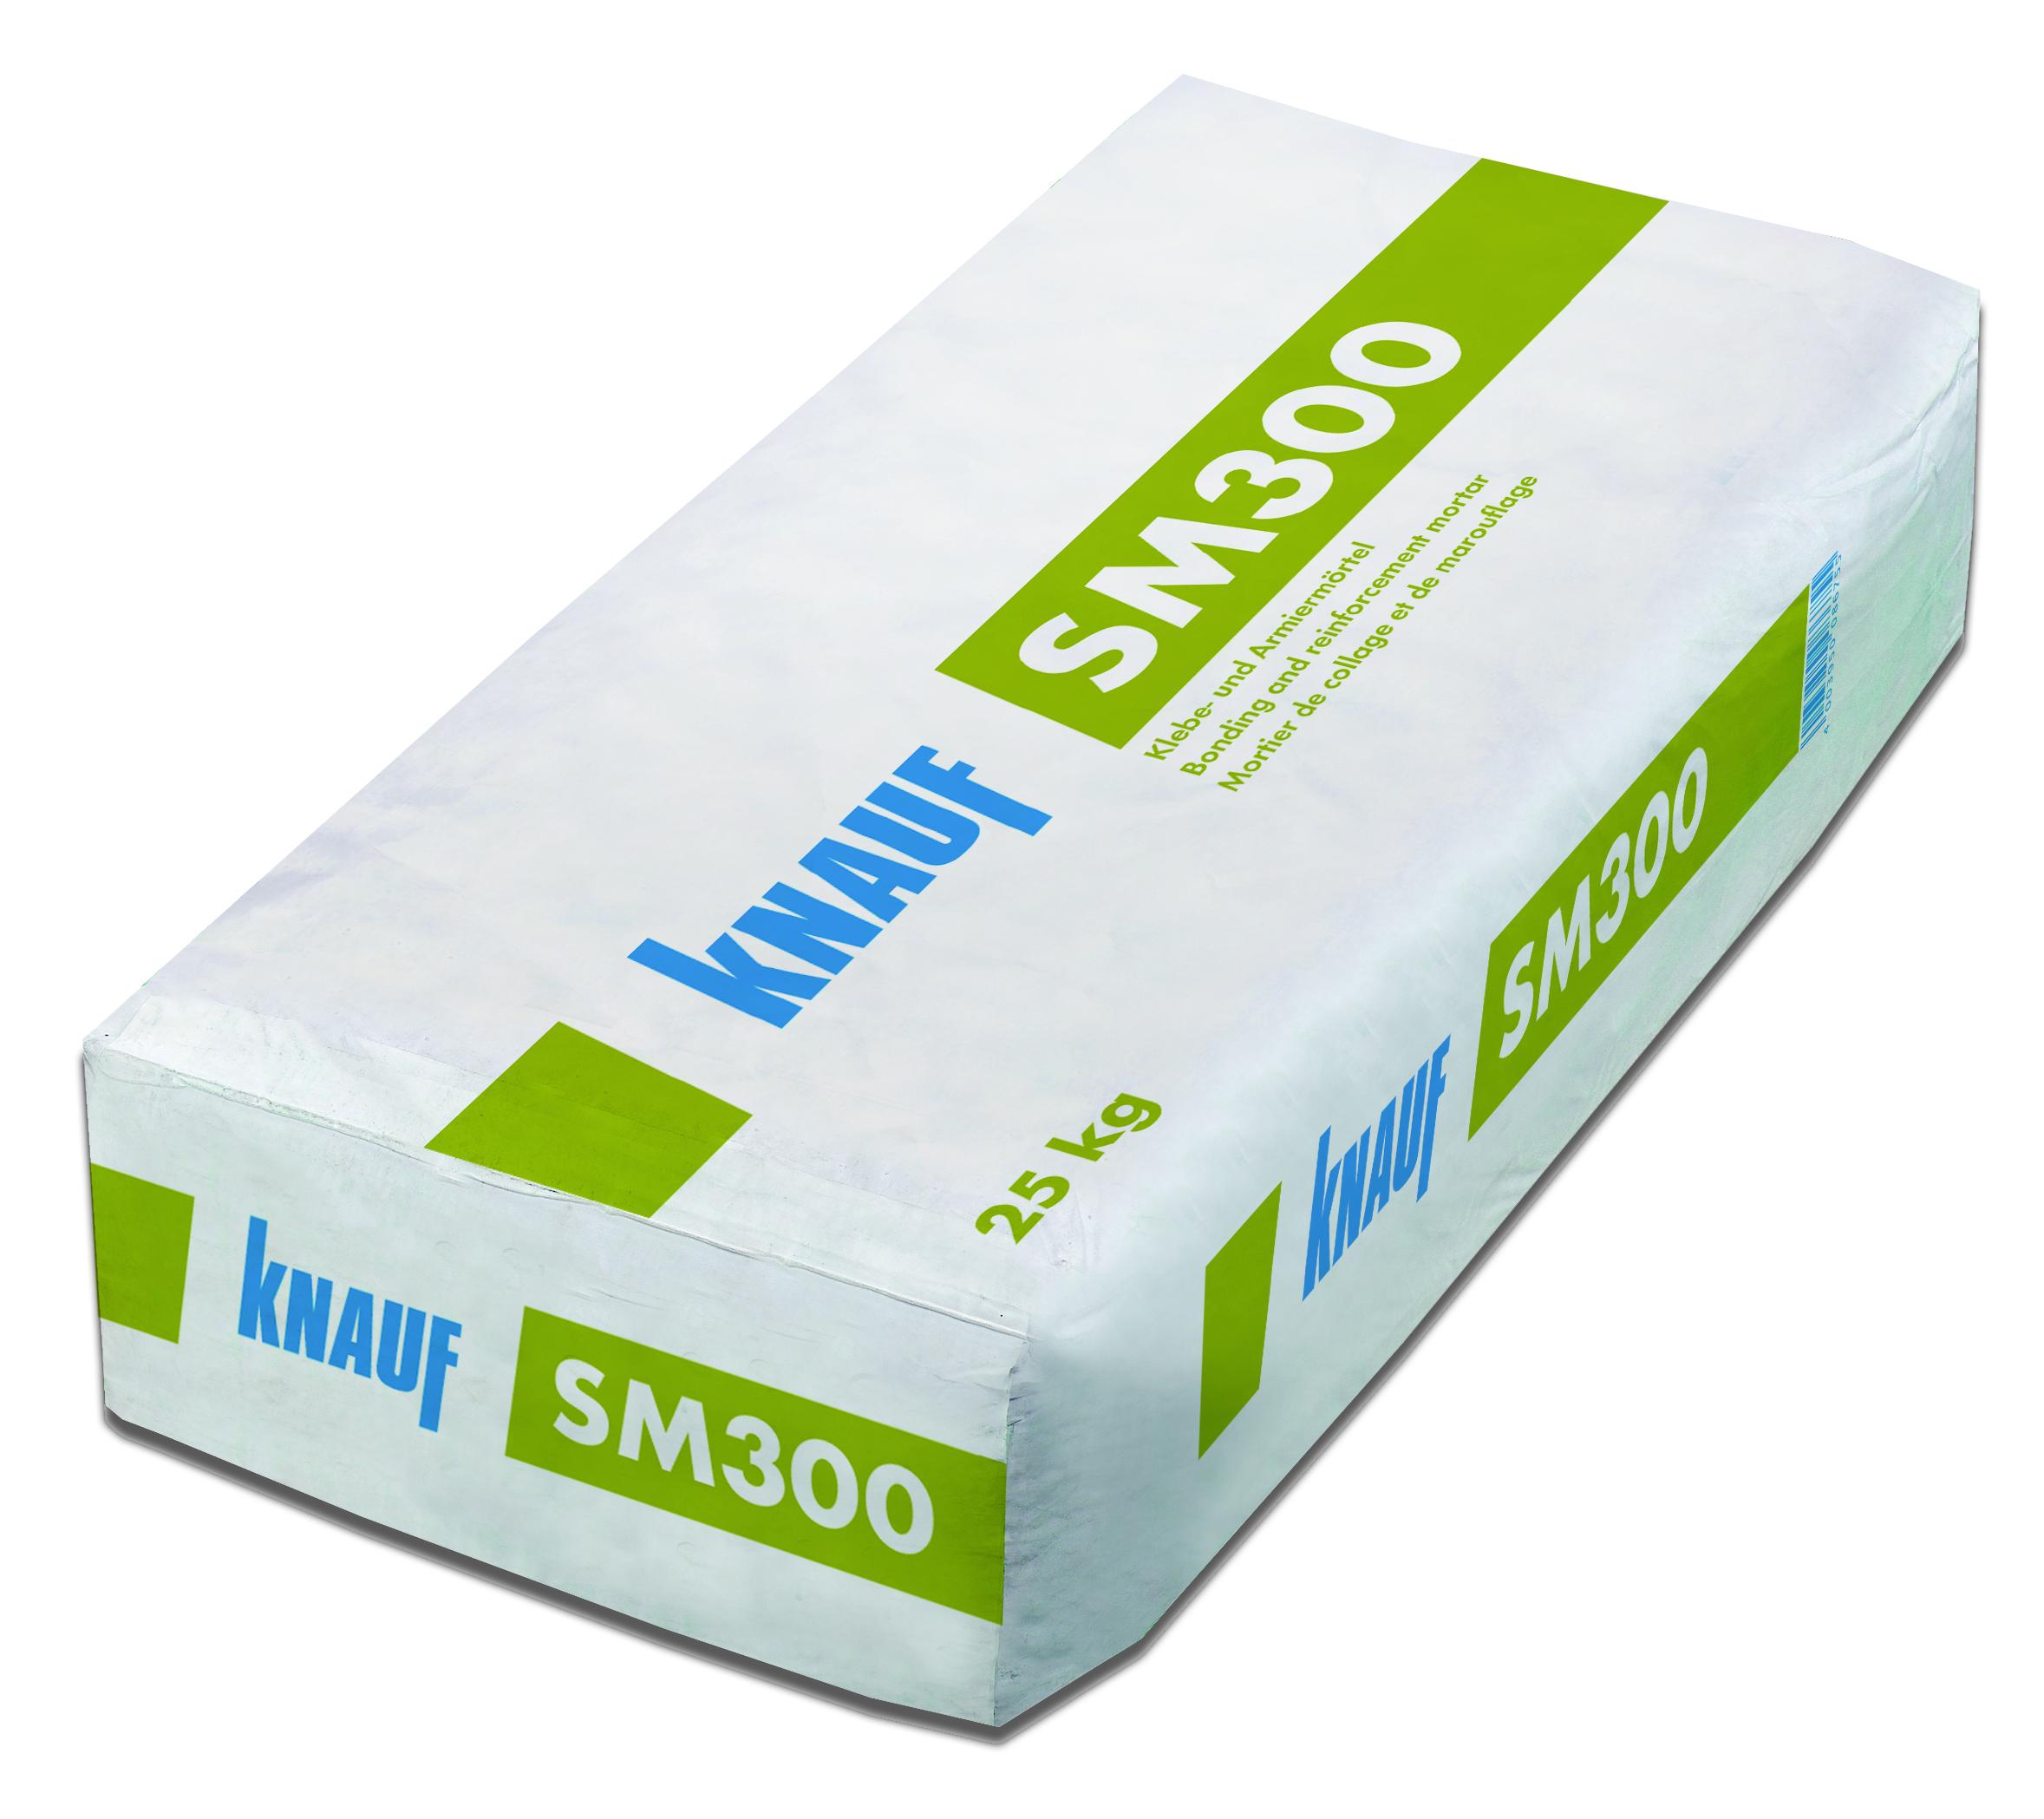 SM300